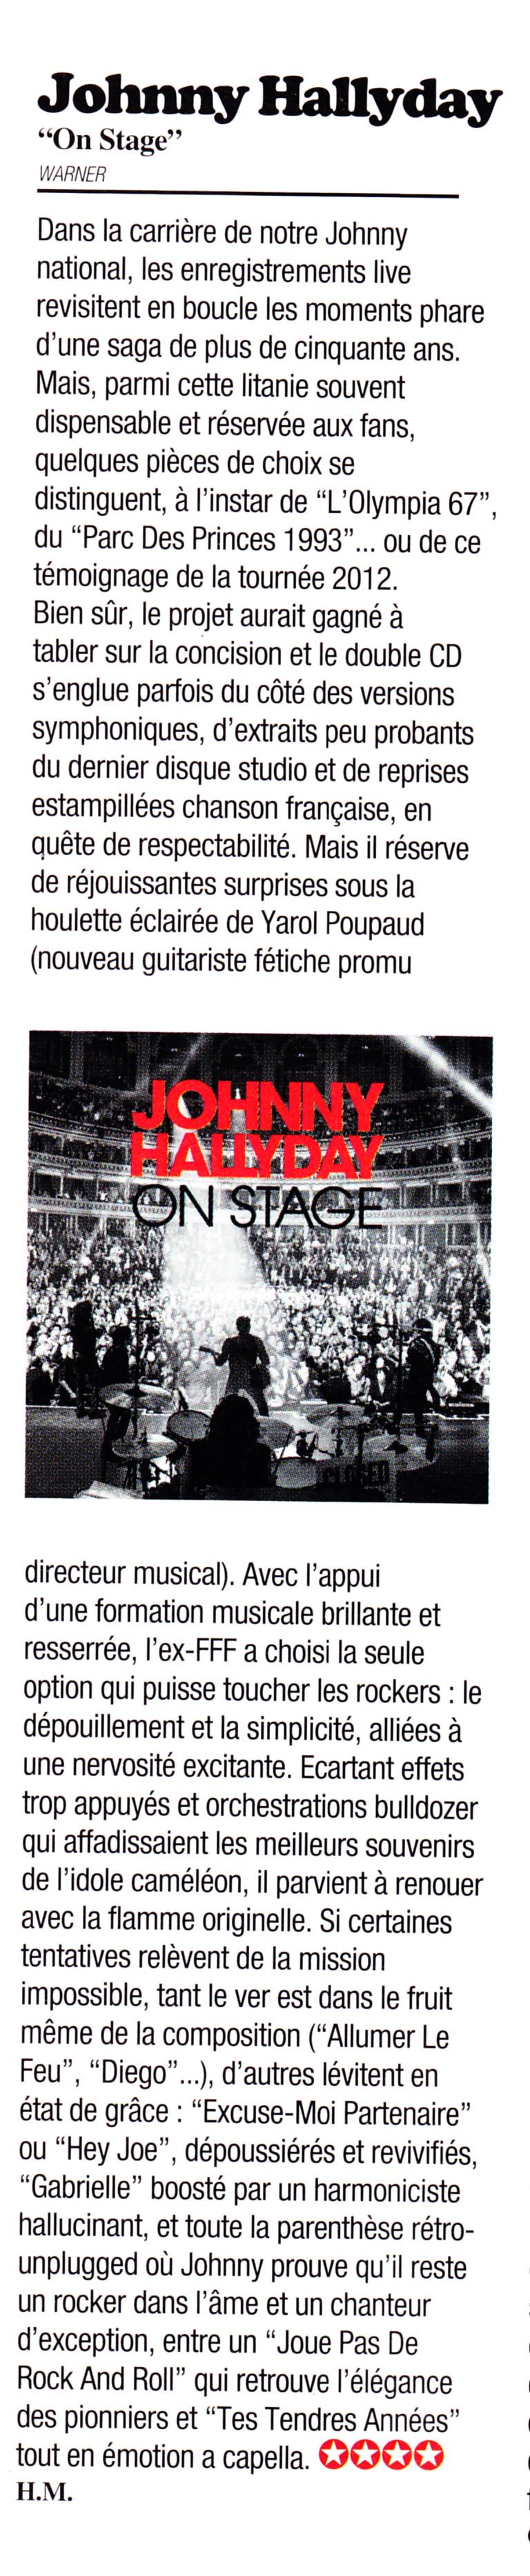 Yarol Poupaud, Black Minou & Johnny Hallyday par Philippe Manoeuvre (Rock&Folk) - Page 2 13071307353115789311378458